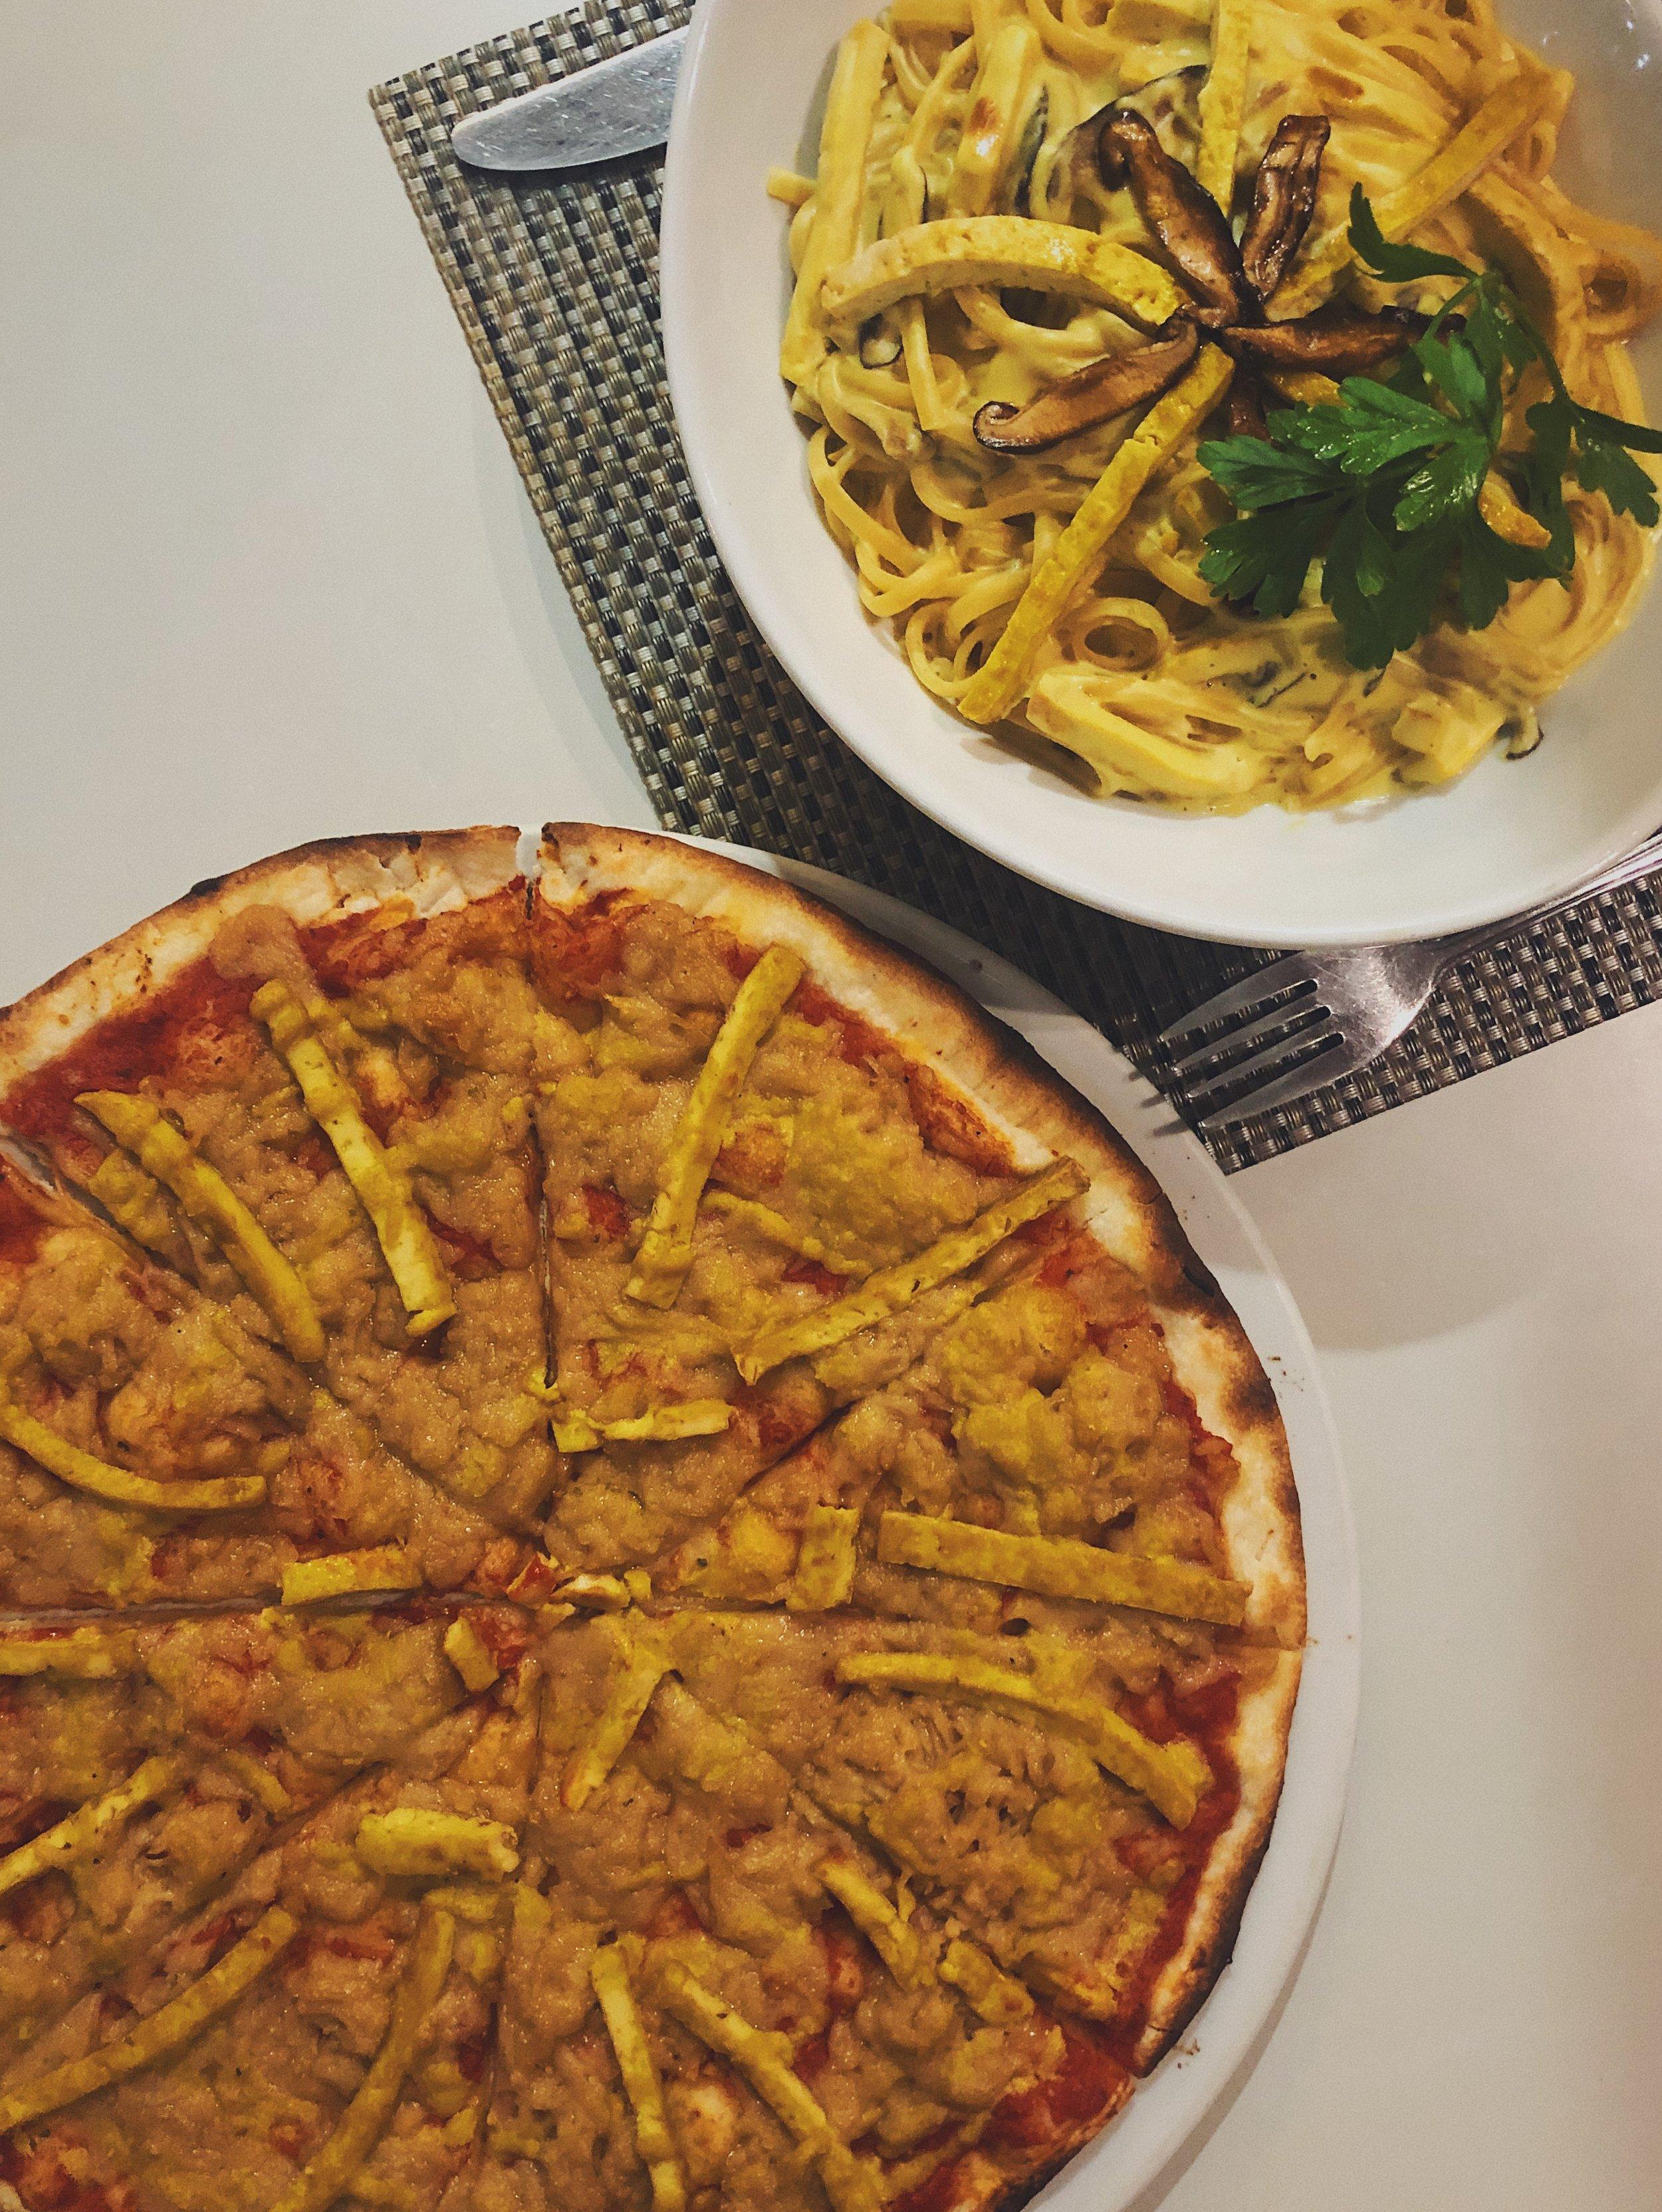 Pizza + pasta + tofu = my heart